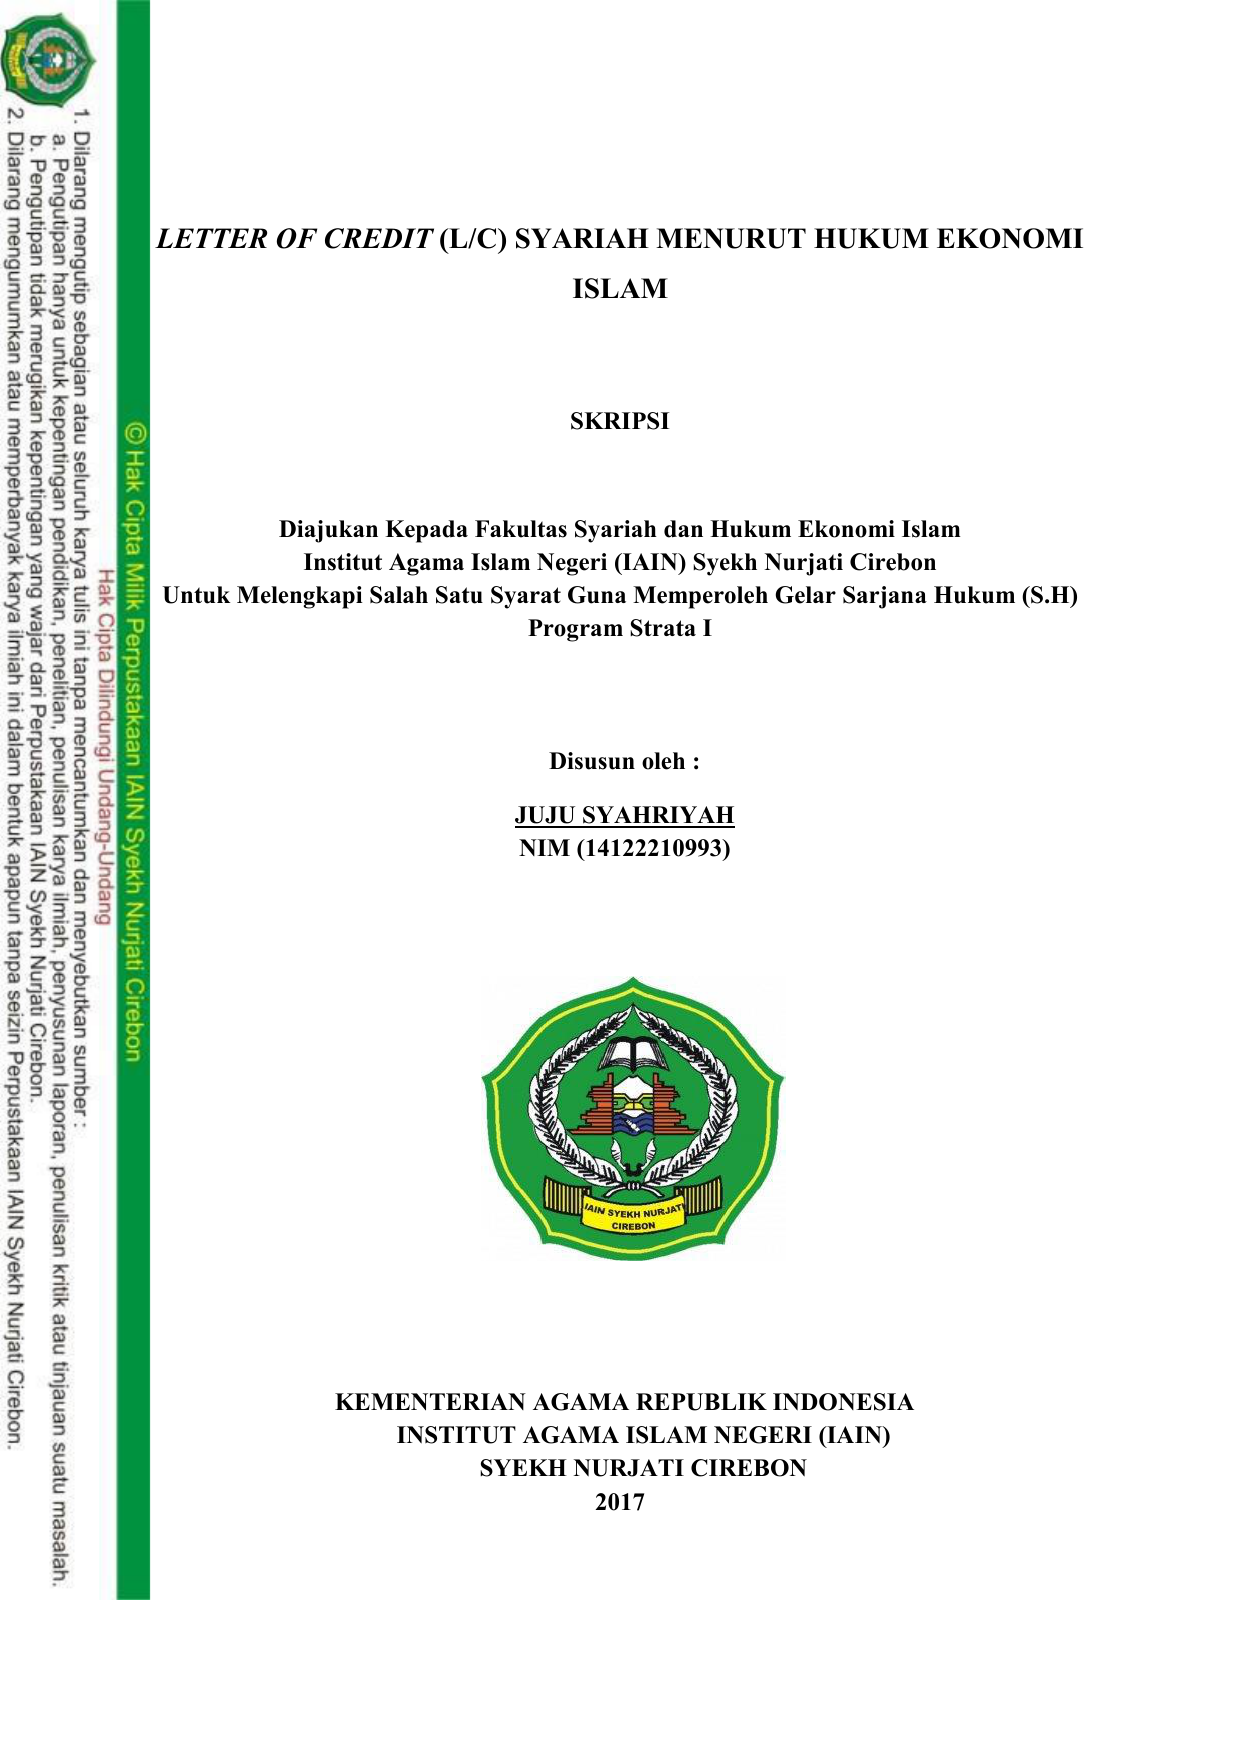 Skripsi Ekonomi Islam Kualitatif